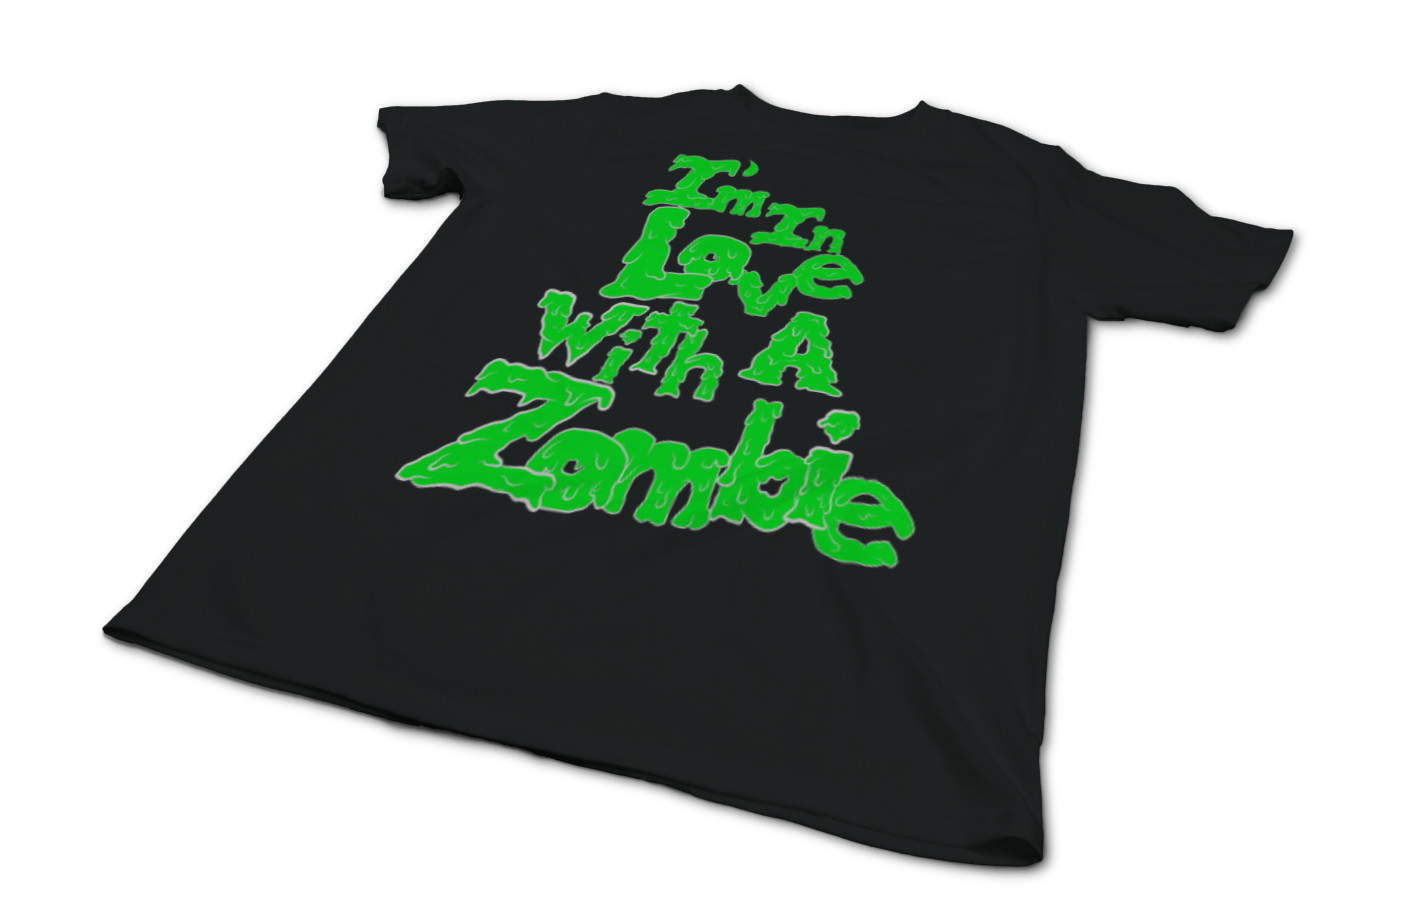 Ekc green zombie  1538016934